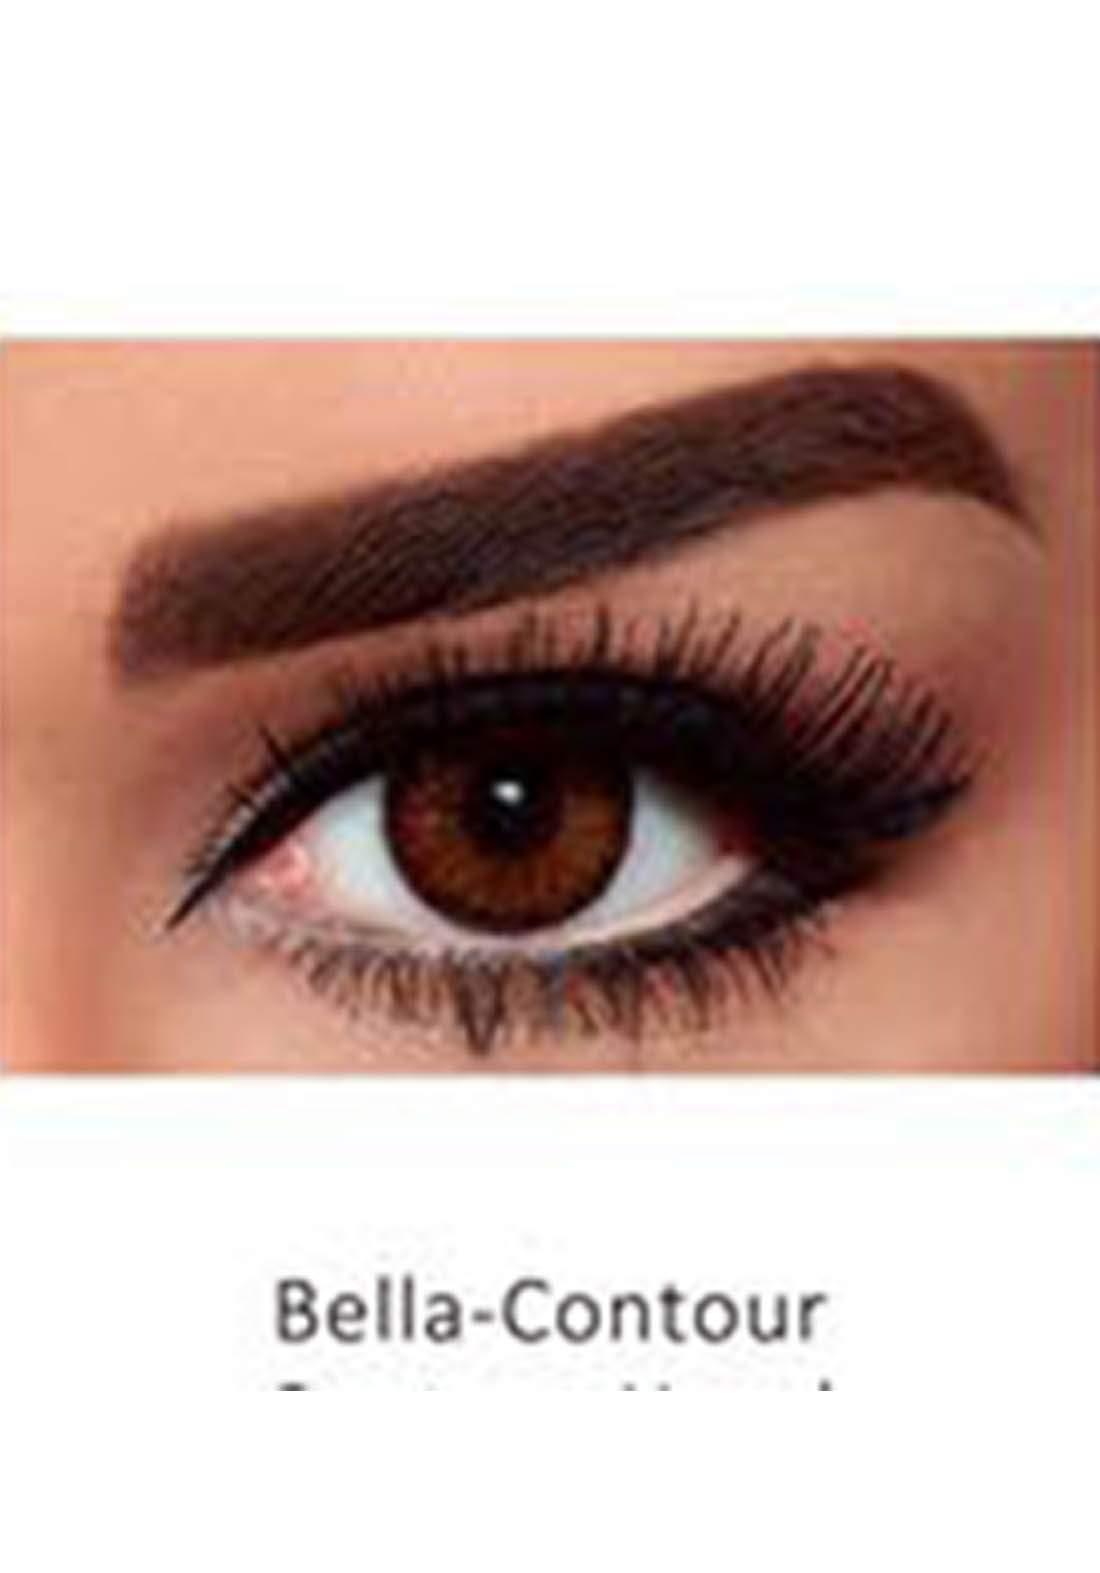 Bella Classic 301005 Contact Lenses 3 Months Use Contour - Hazel  No.5 عدسات لاصقة